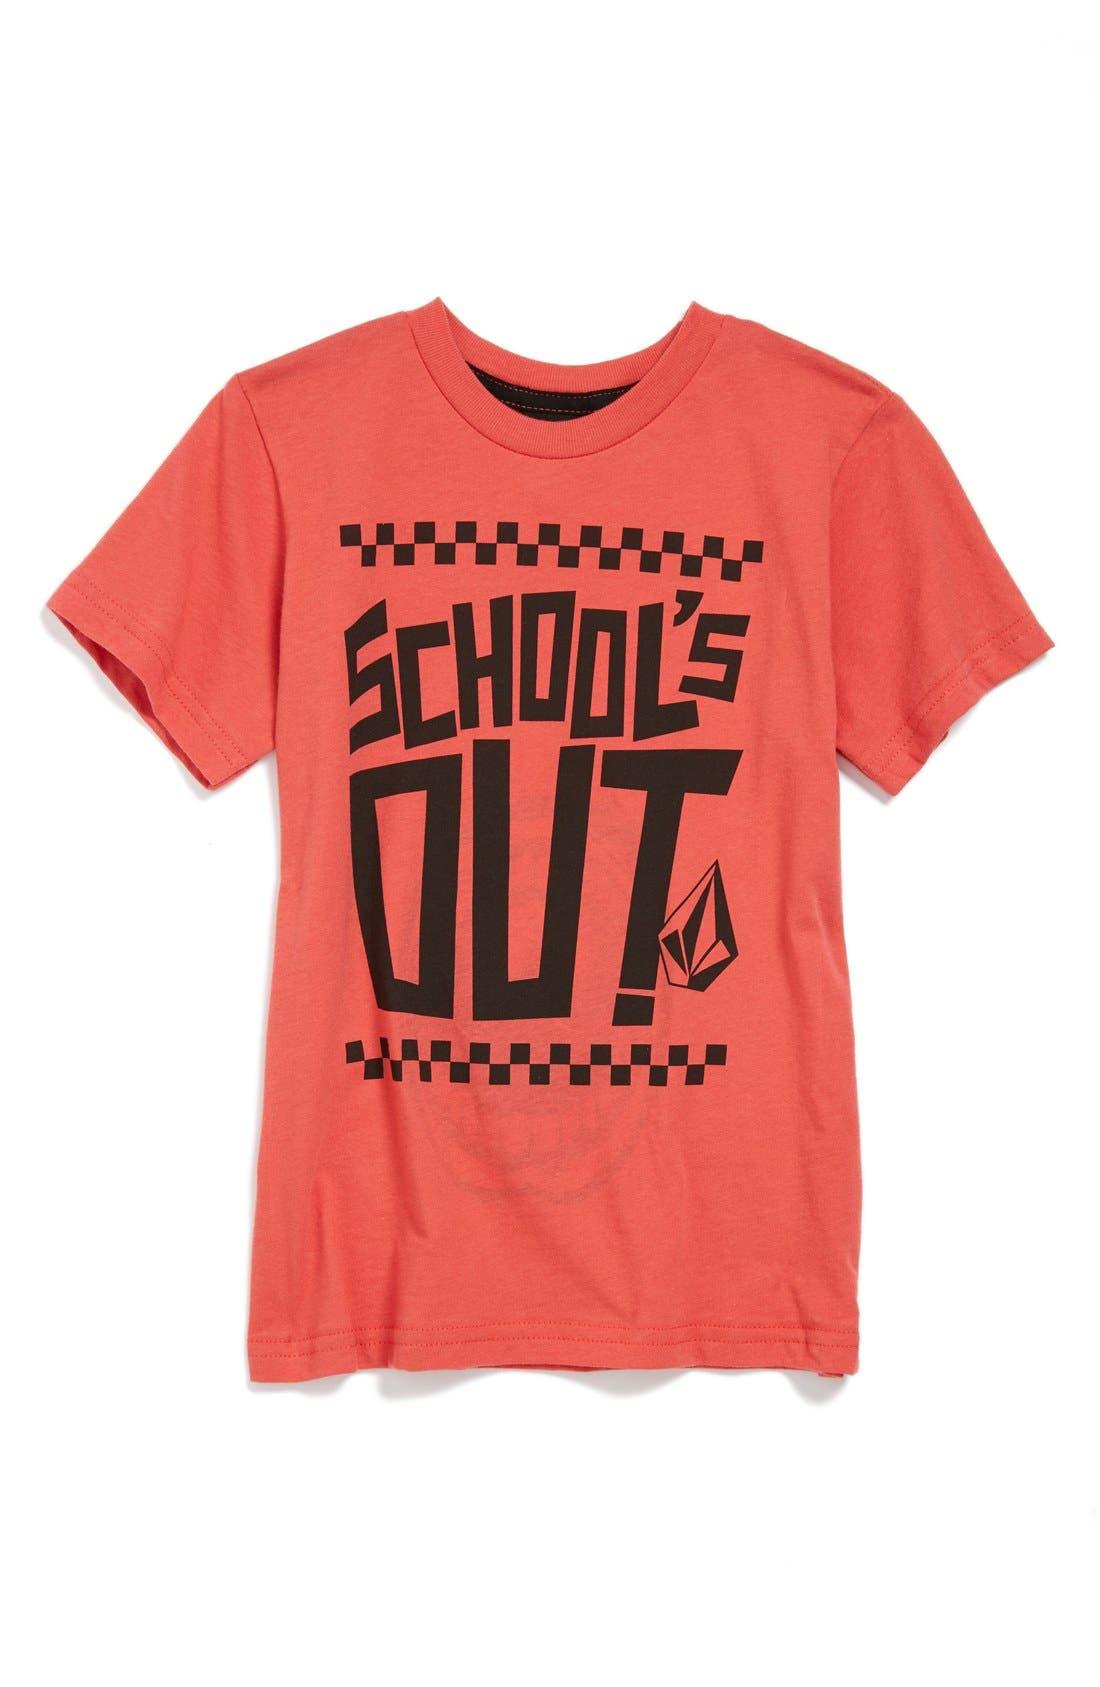 Main Image - Volcom 'School's Out' Screenprint Short Sleeve T-Shirt (Little Boys & Big Boys)